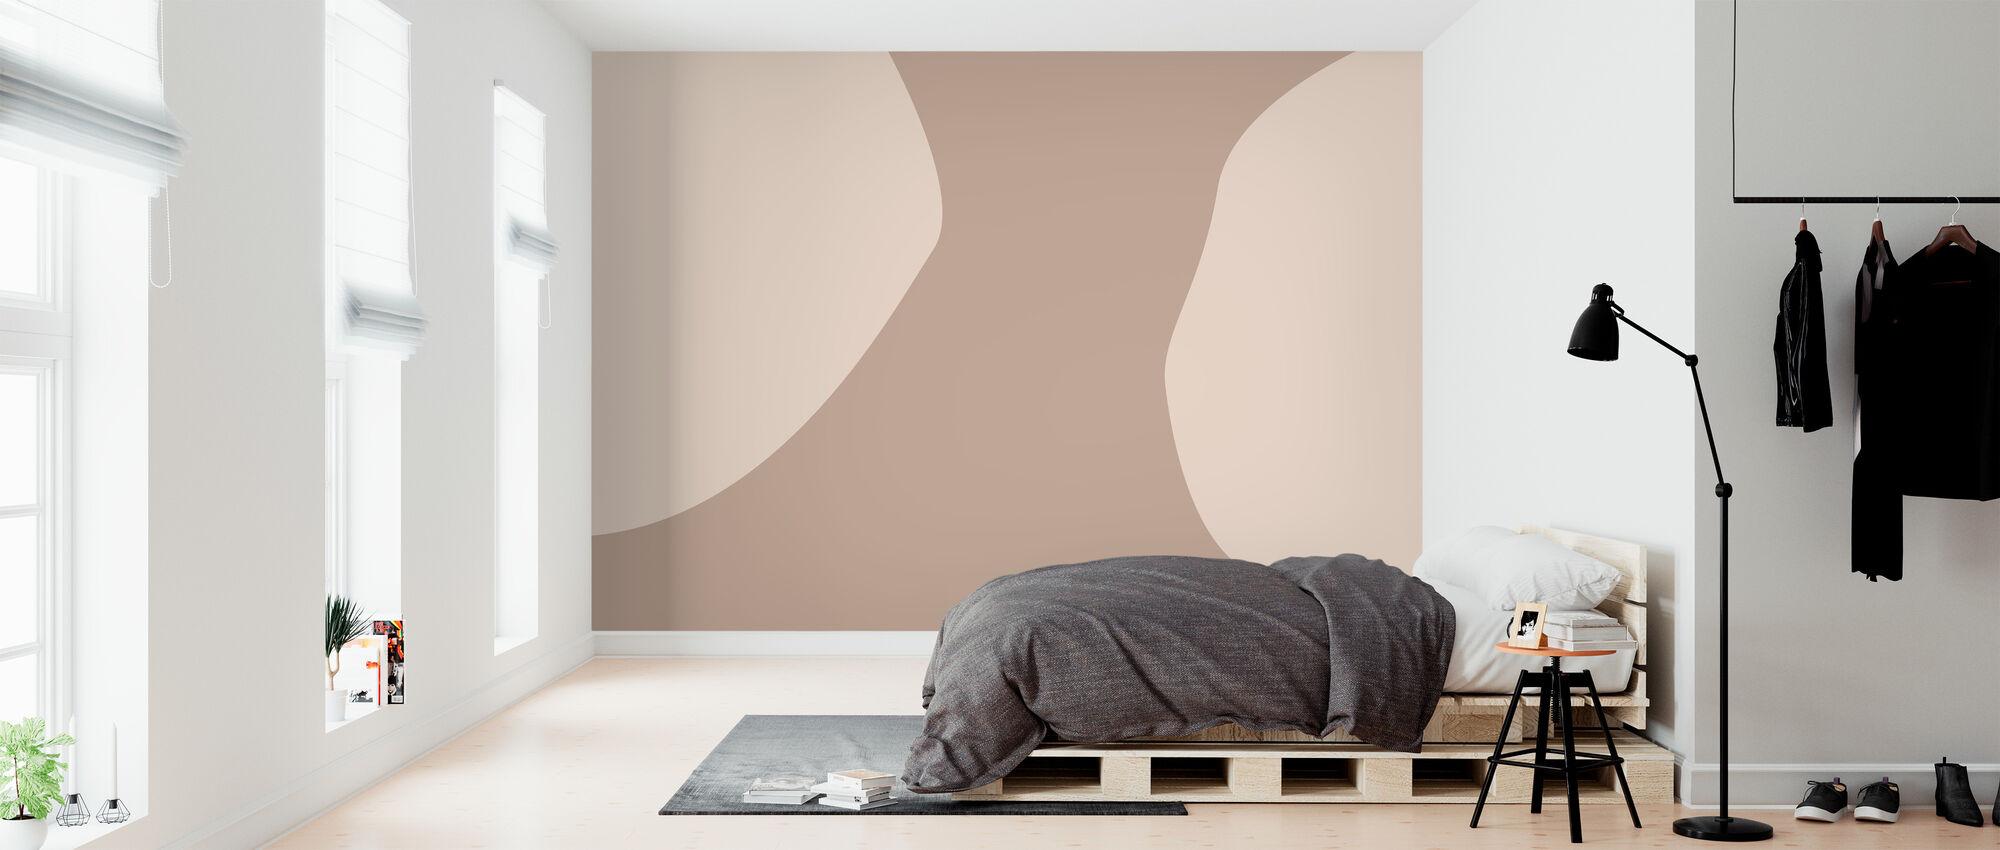 Camel Coloured - Wallpaper - Bedroom